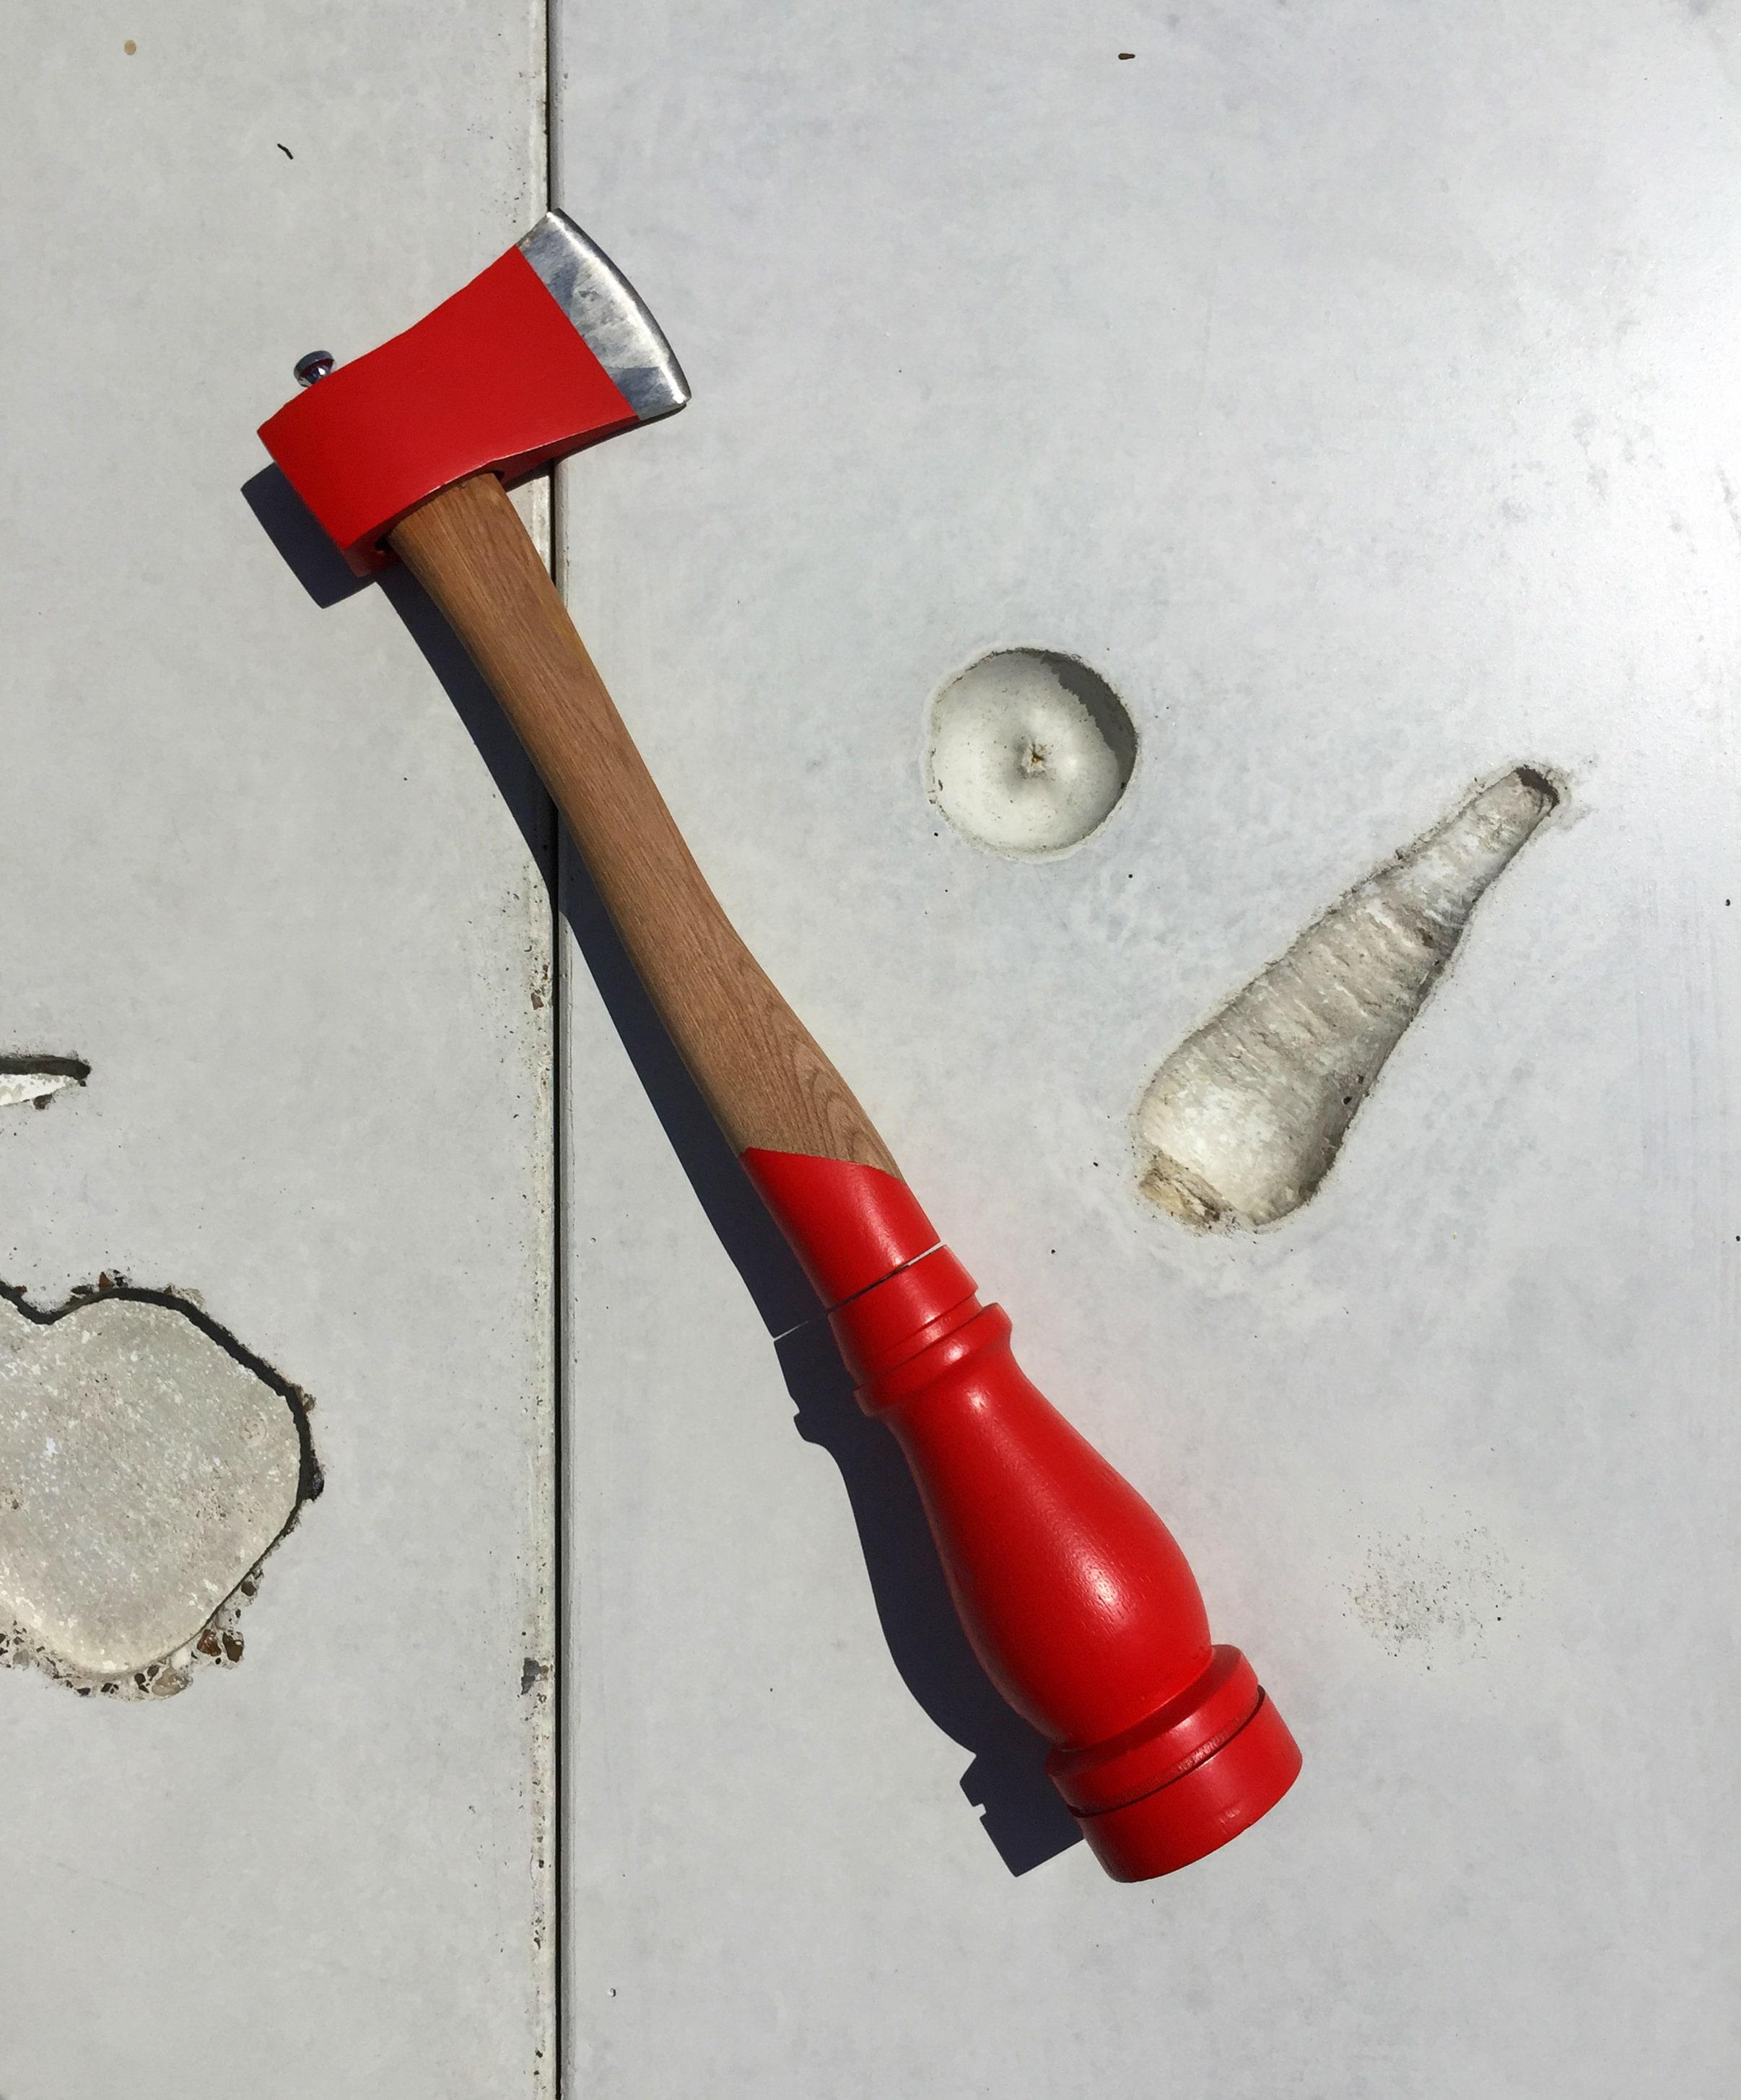 Bespoke-Concrete-Table4